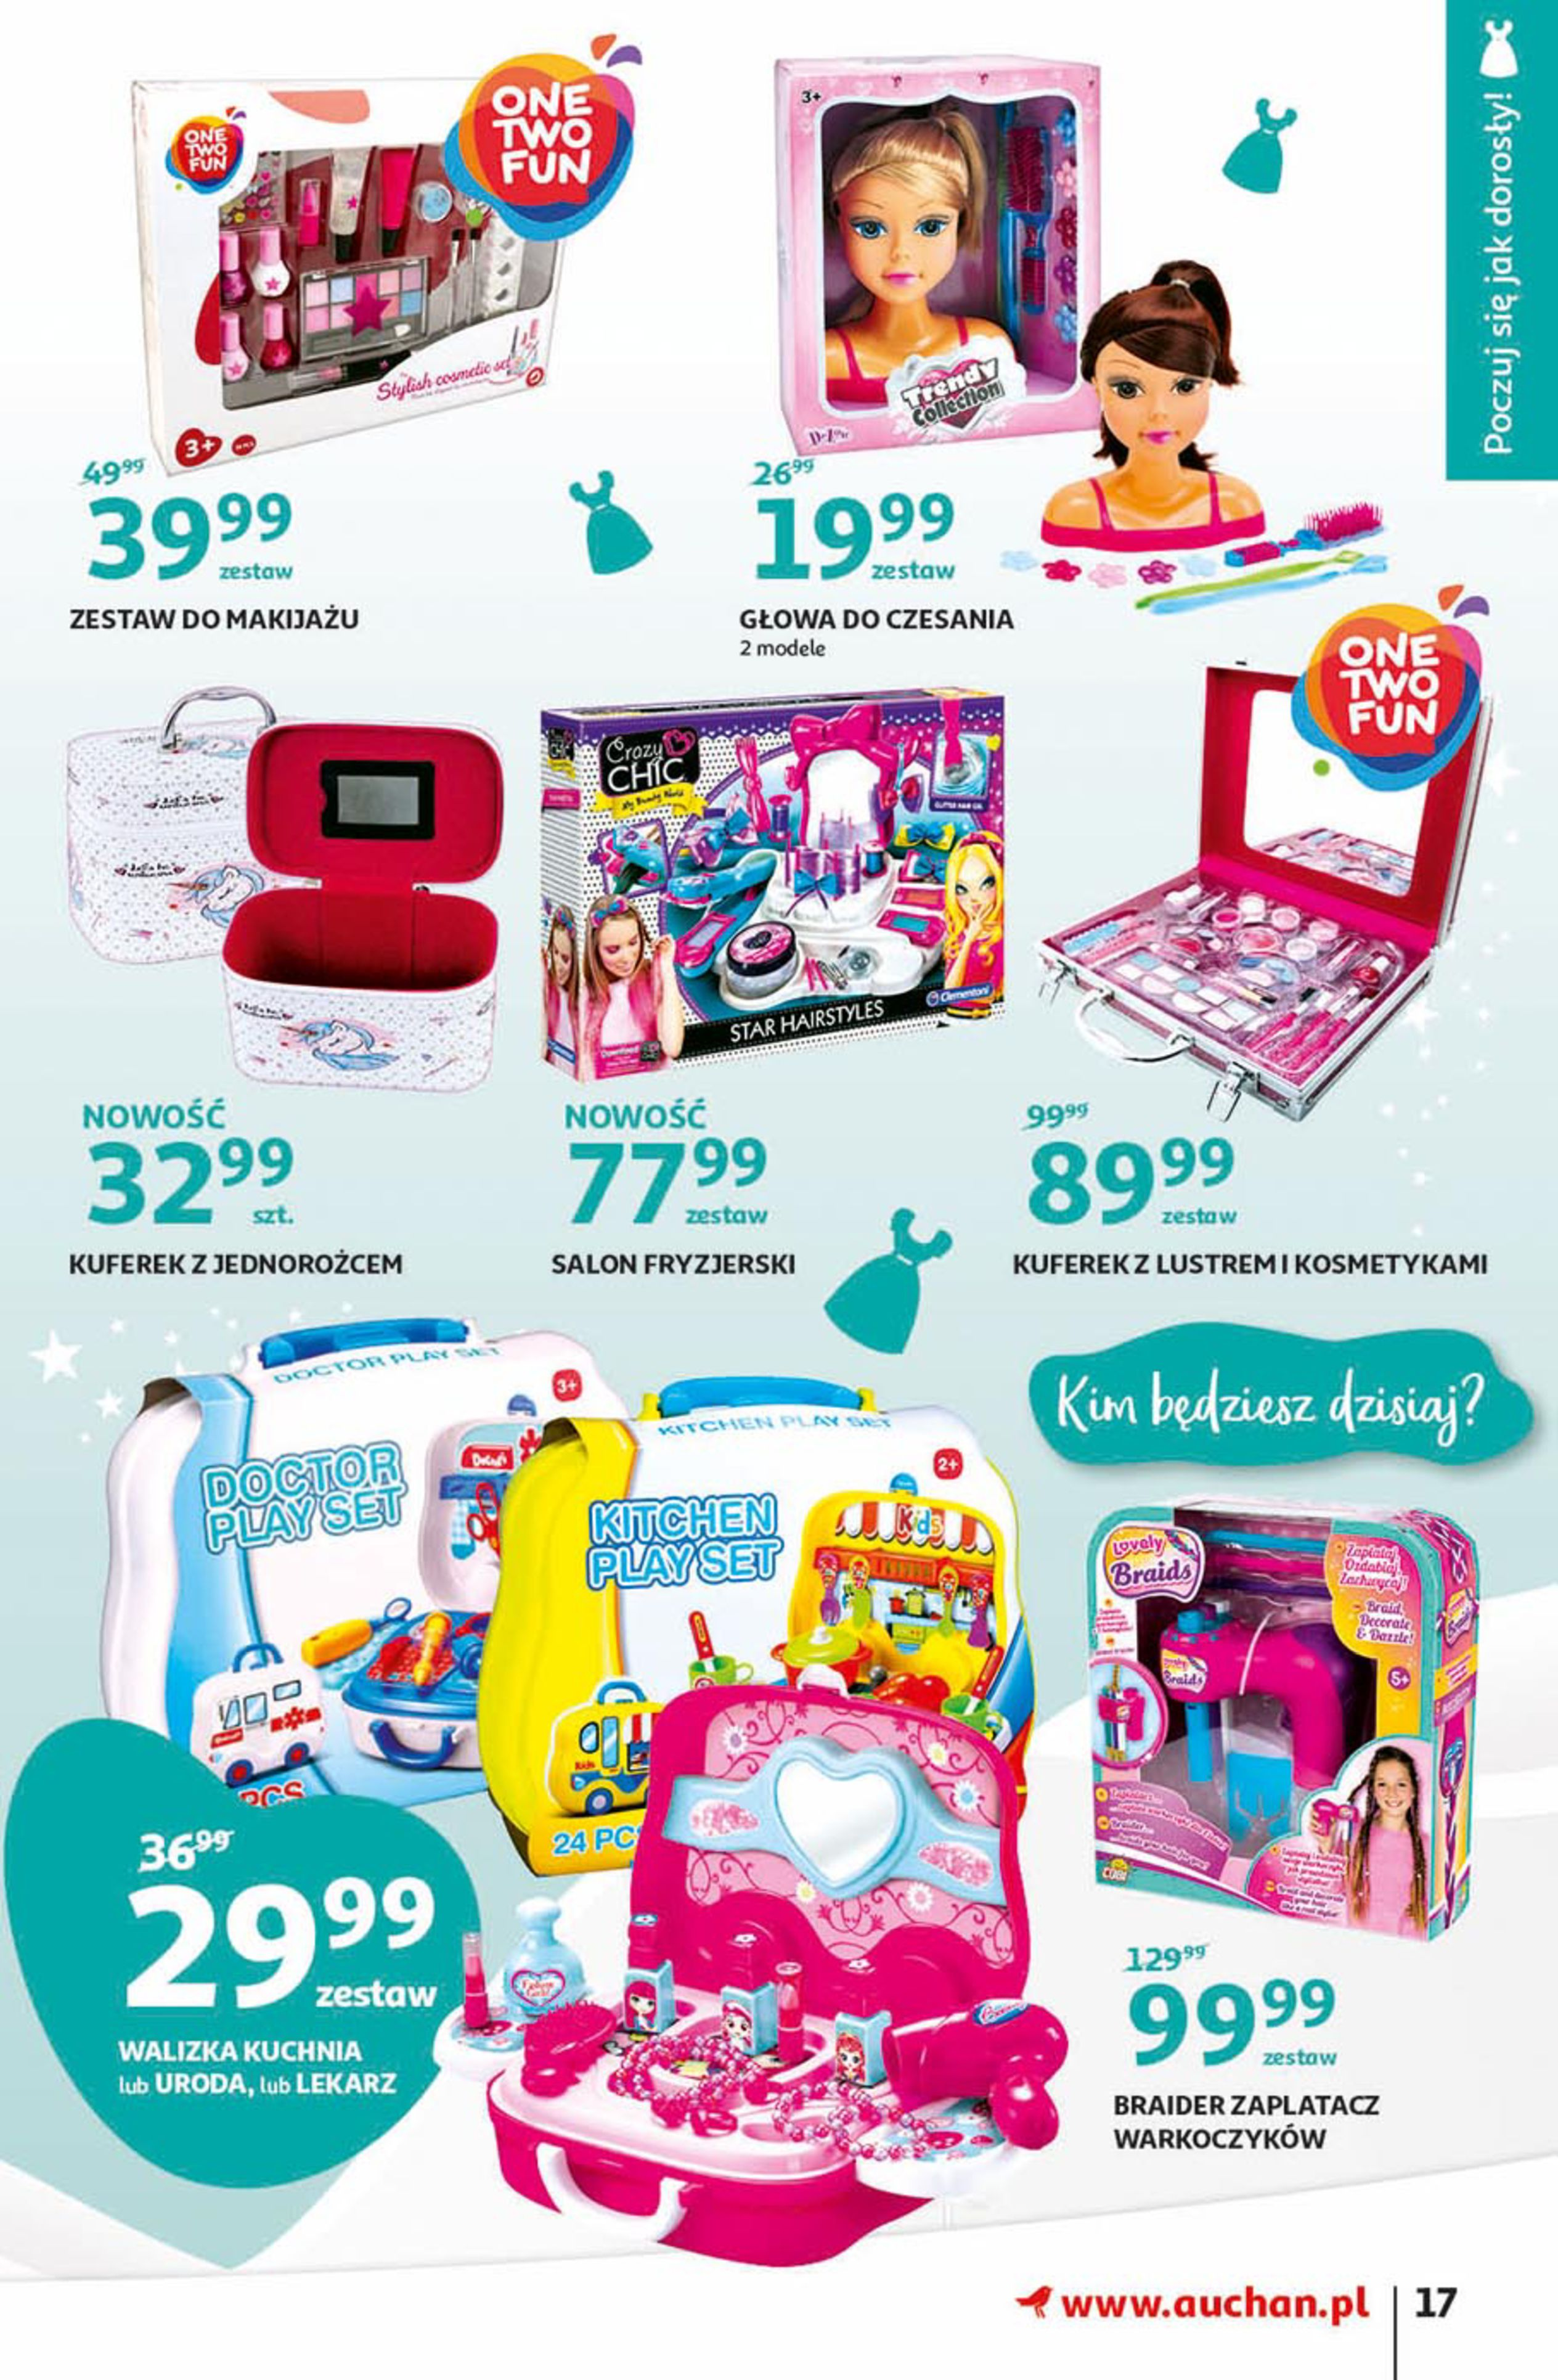 Gazetka Auchan - Magia zabawek Hipermarkety-06.11.2019-20.11.2019-page-17